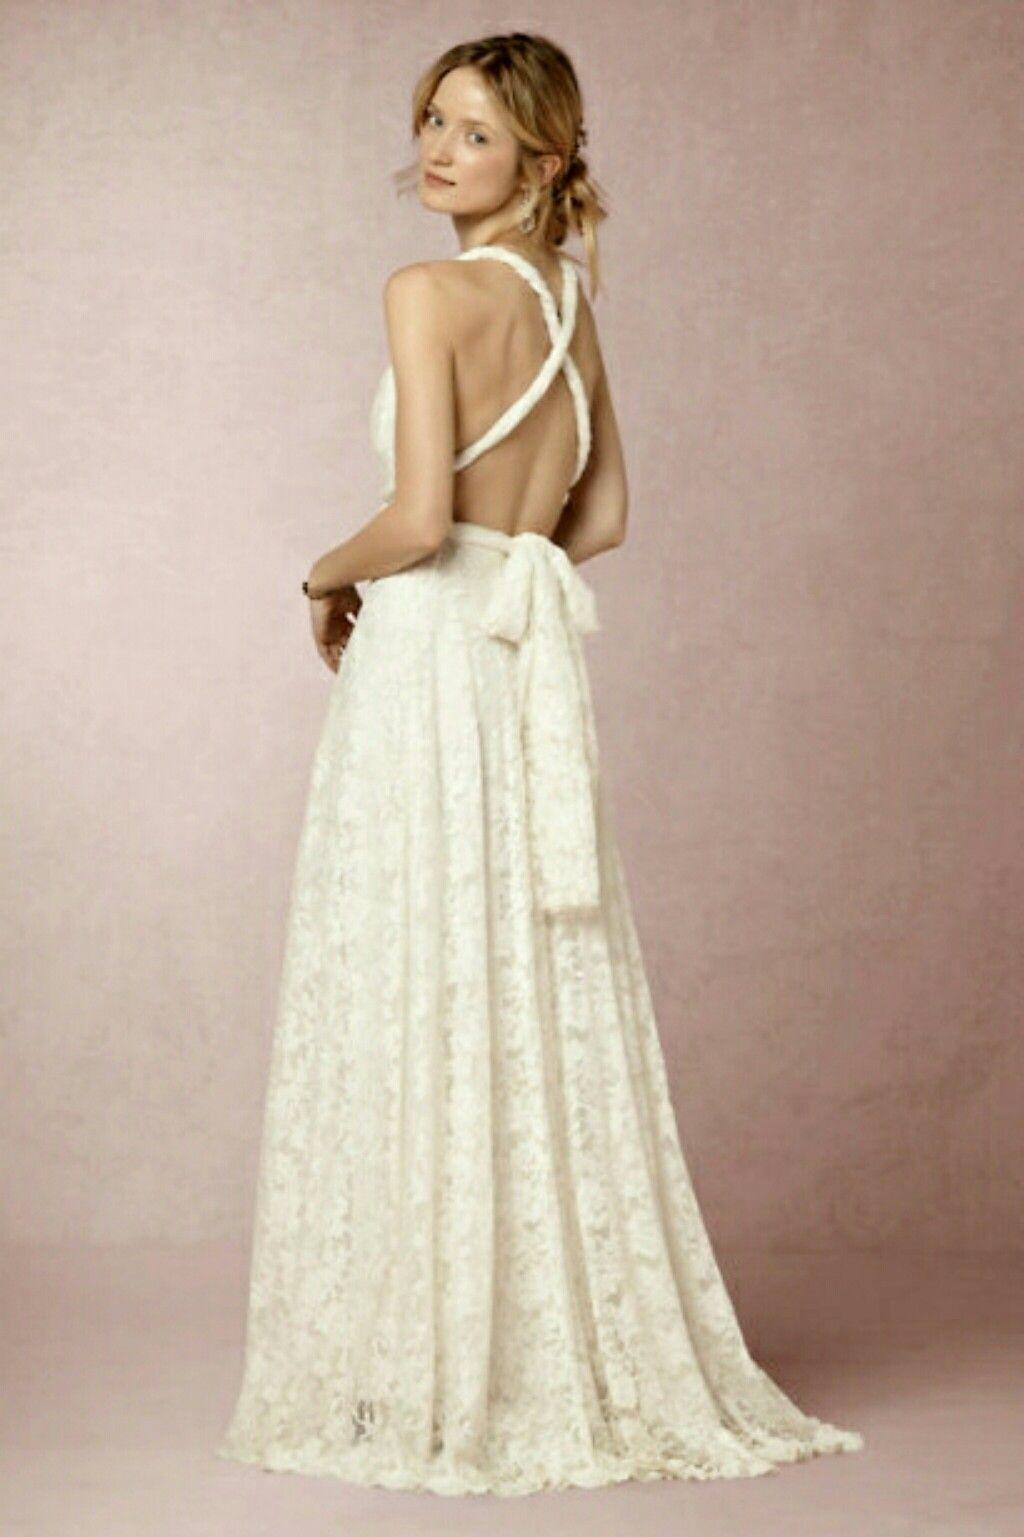 Long dresses for wedding reception  Noelle Dress by BHLDNCOM  Wedding inspiration  Pinterest  Beach